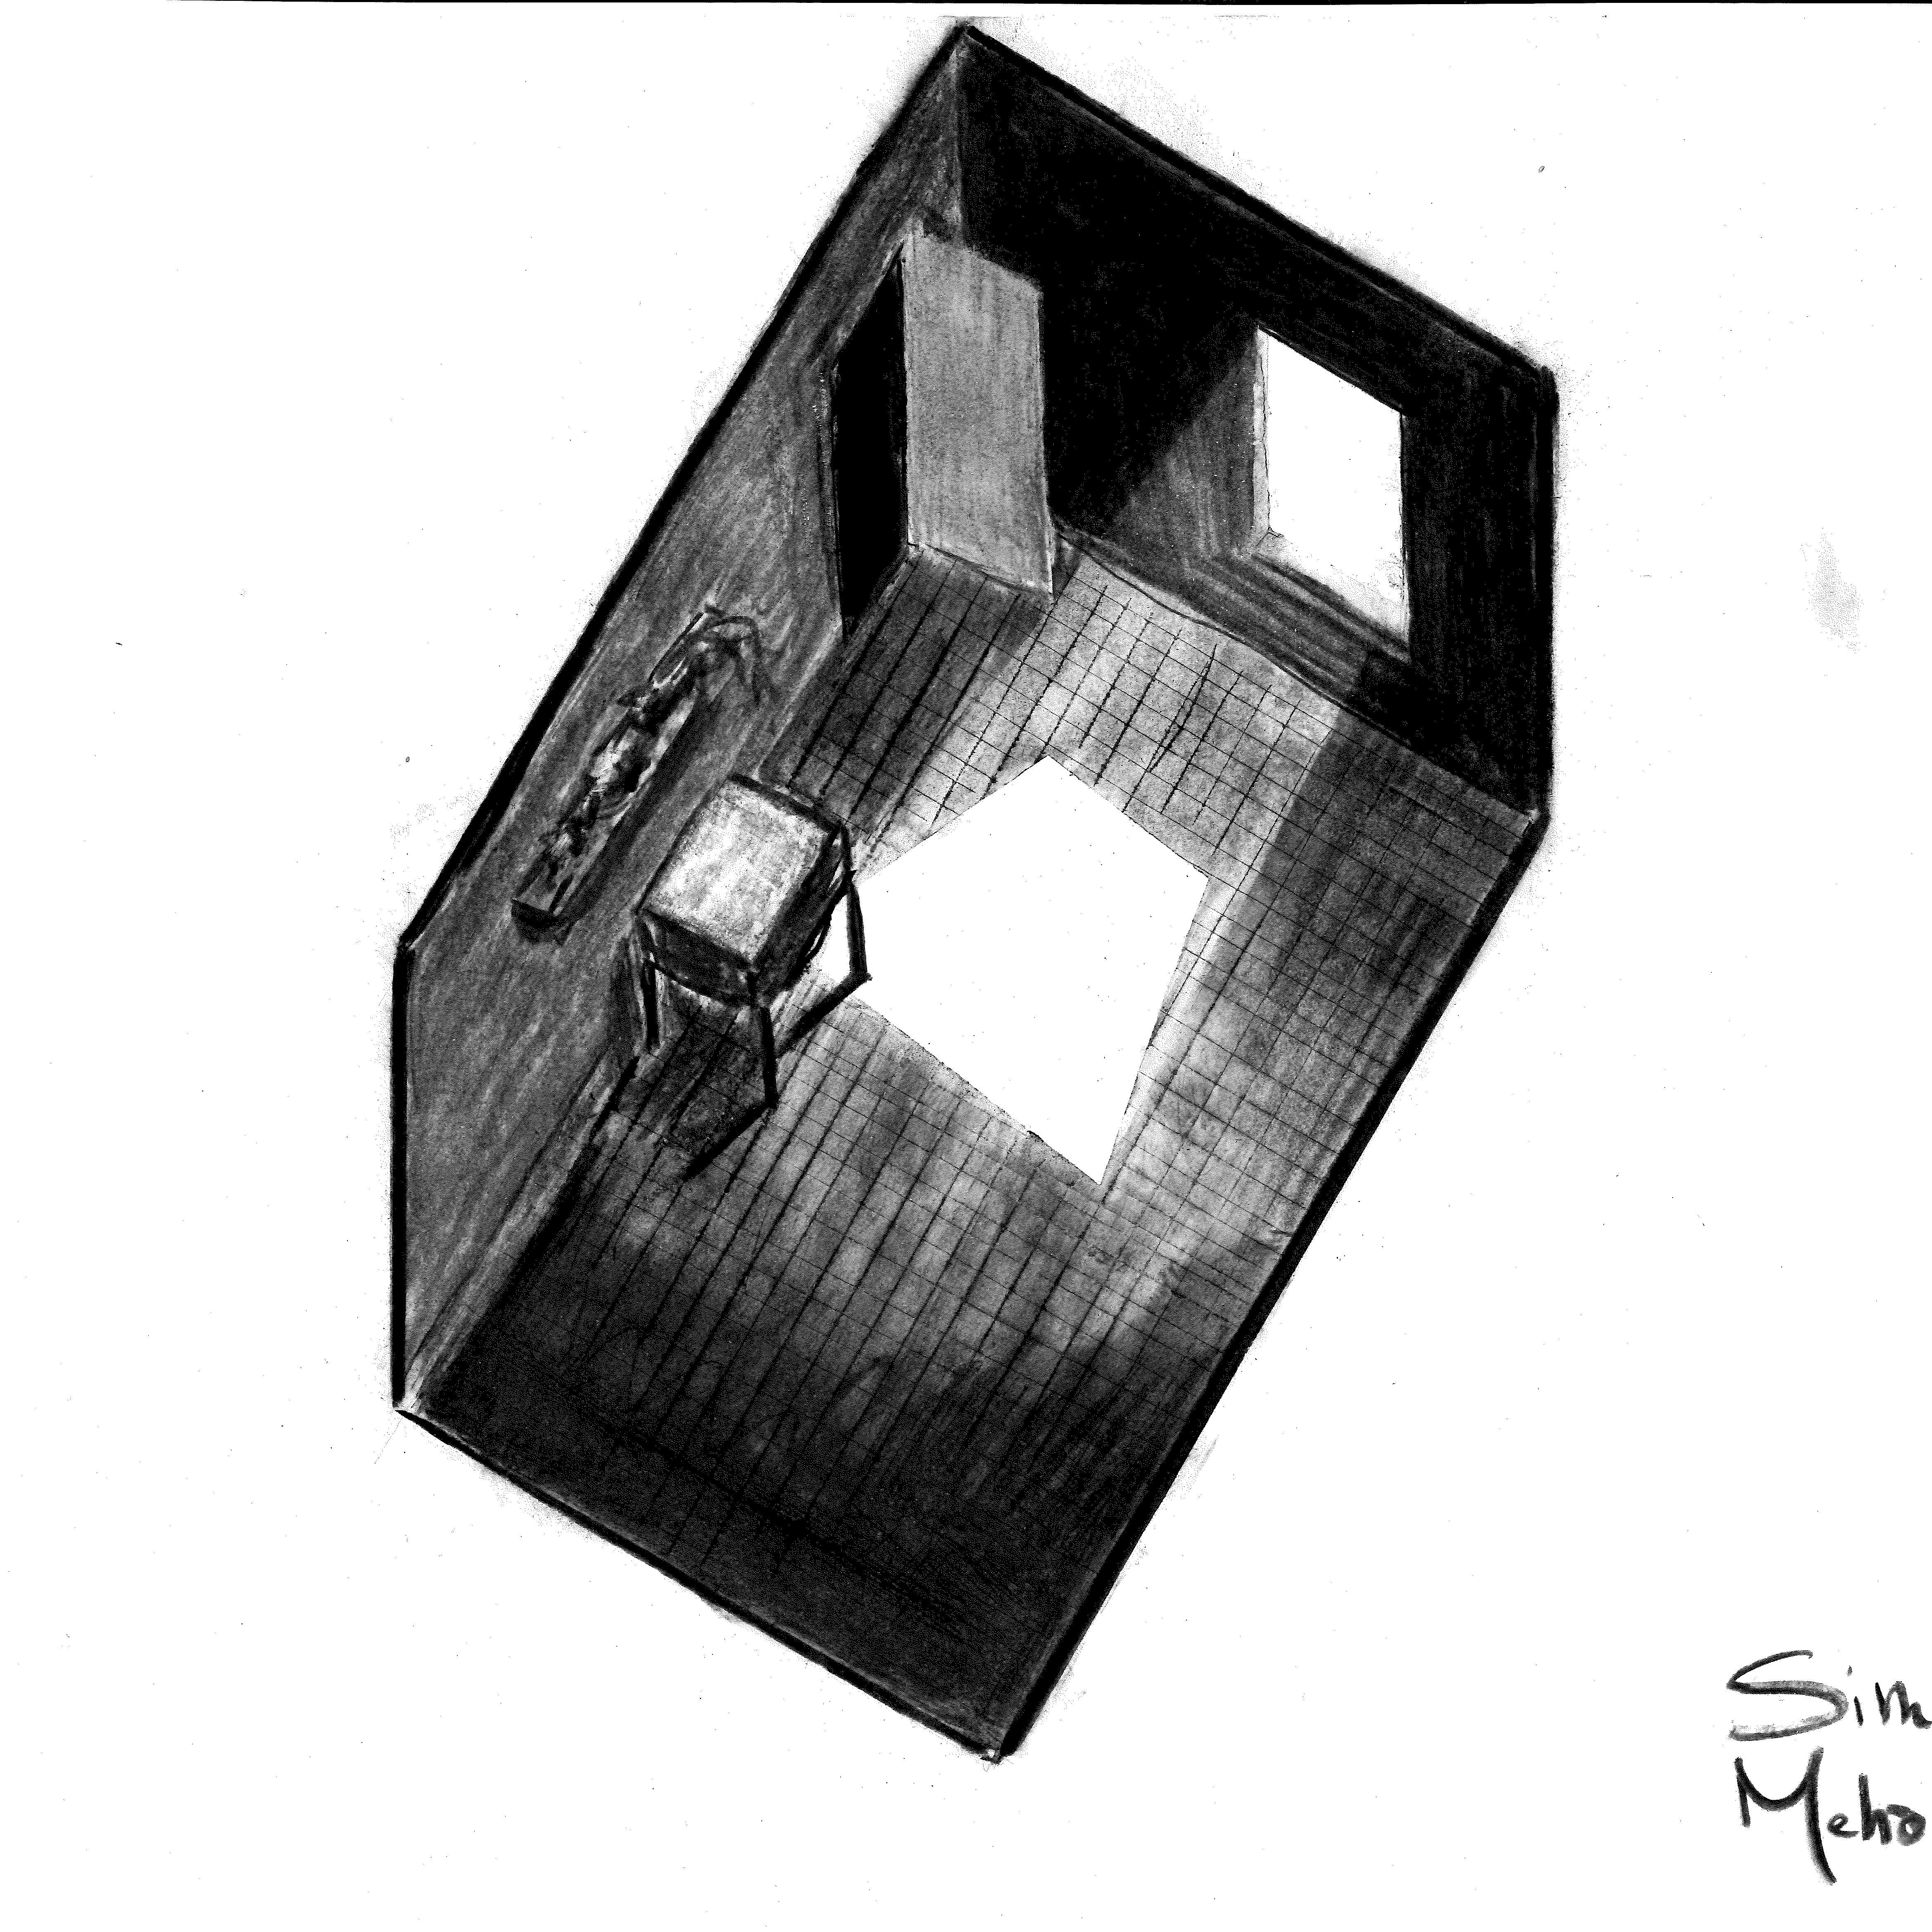 BUCHAREST-lab-ARRET SUR IMAGE 190222-sierranevada-21fev-a3__Page_11